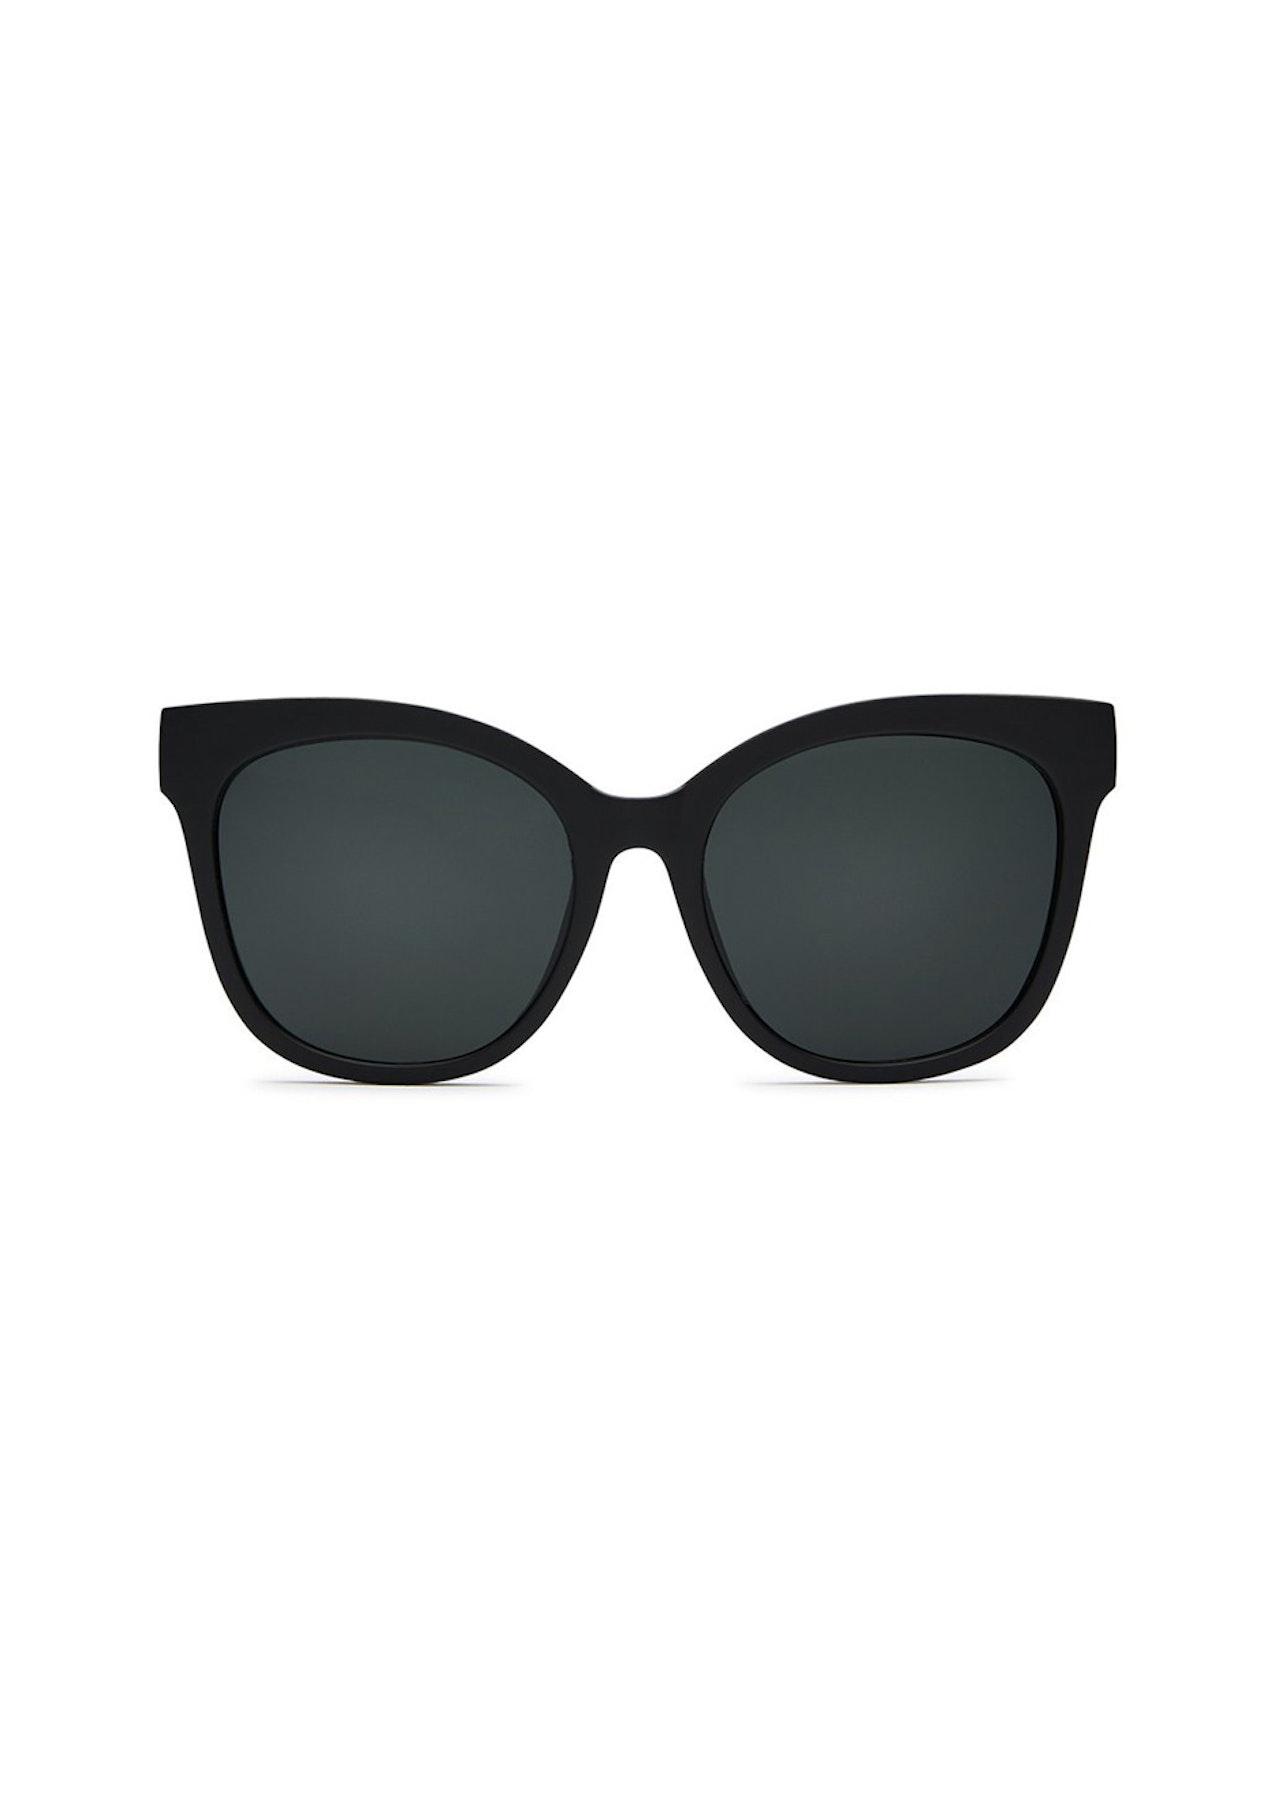 7b672db5ee Quay - Its My Way - Black Smoke - Quay Eyewear Restock - Onceit